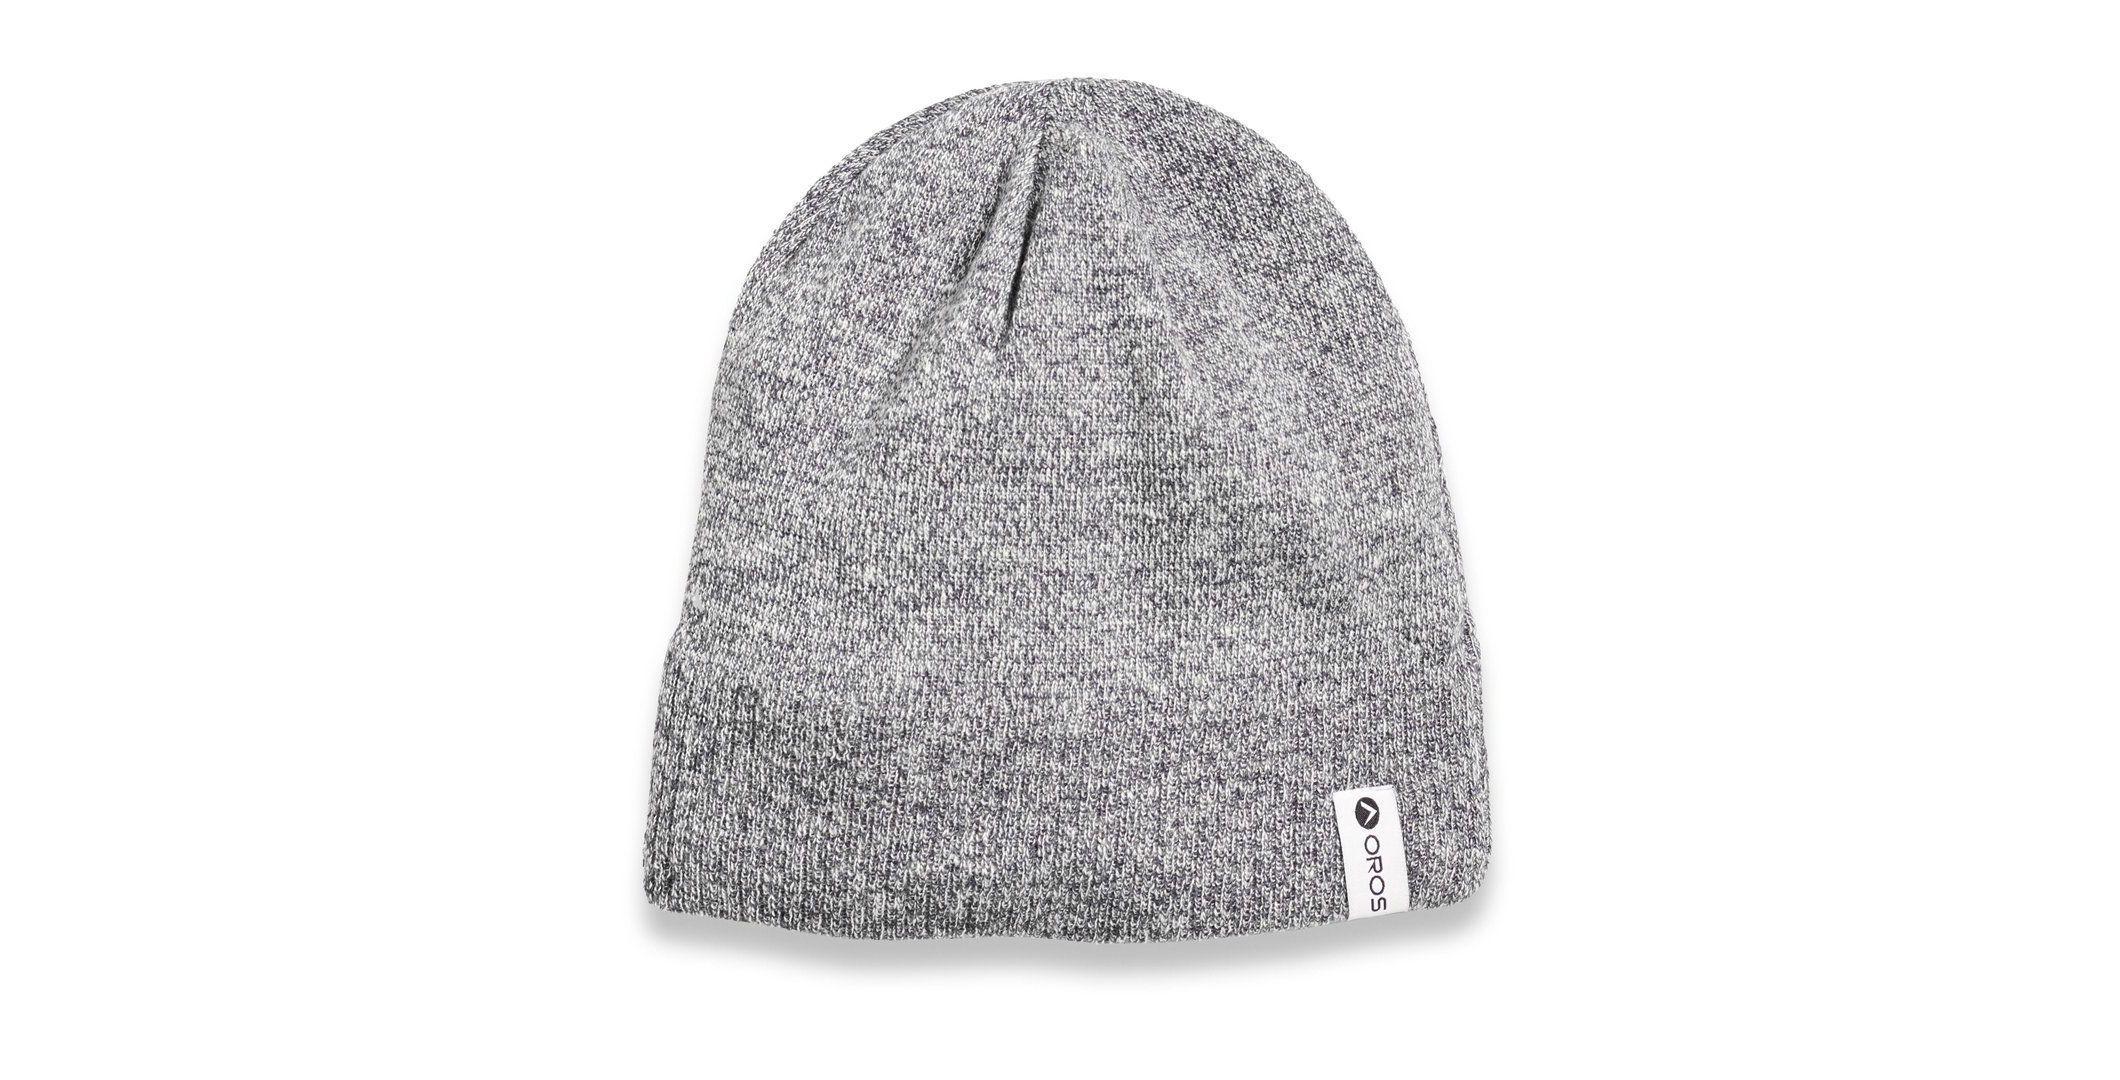 7487f141e7af4 Beanie Hats for Men